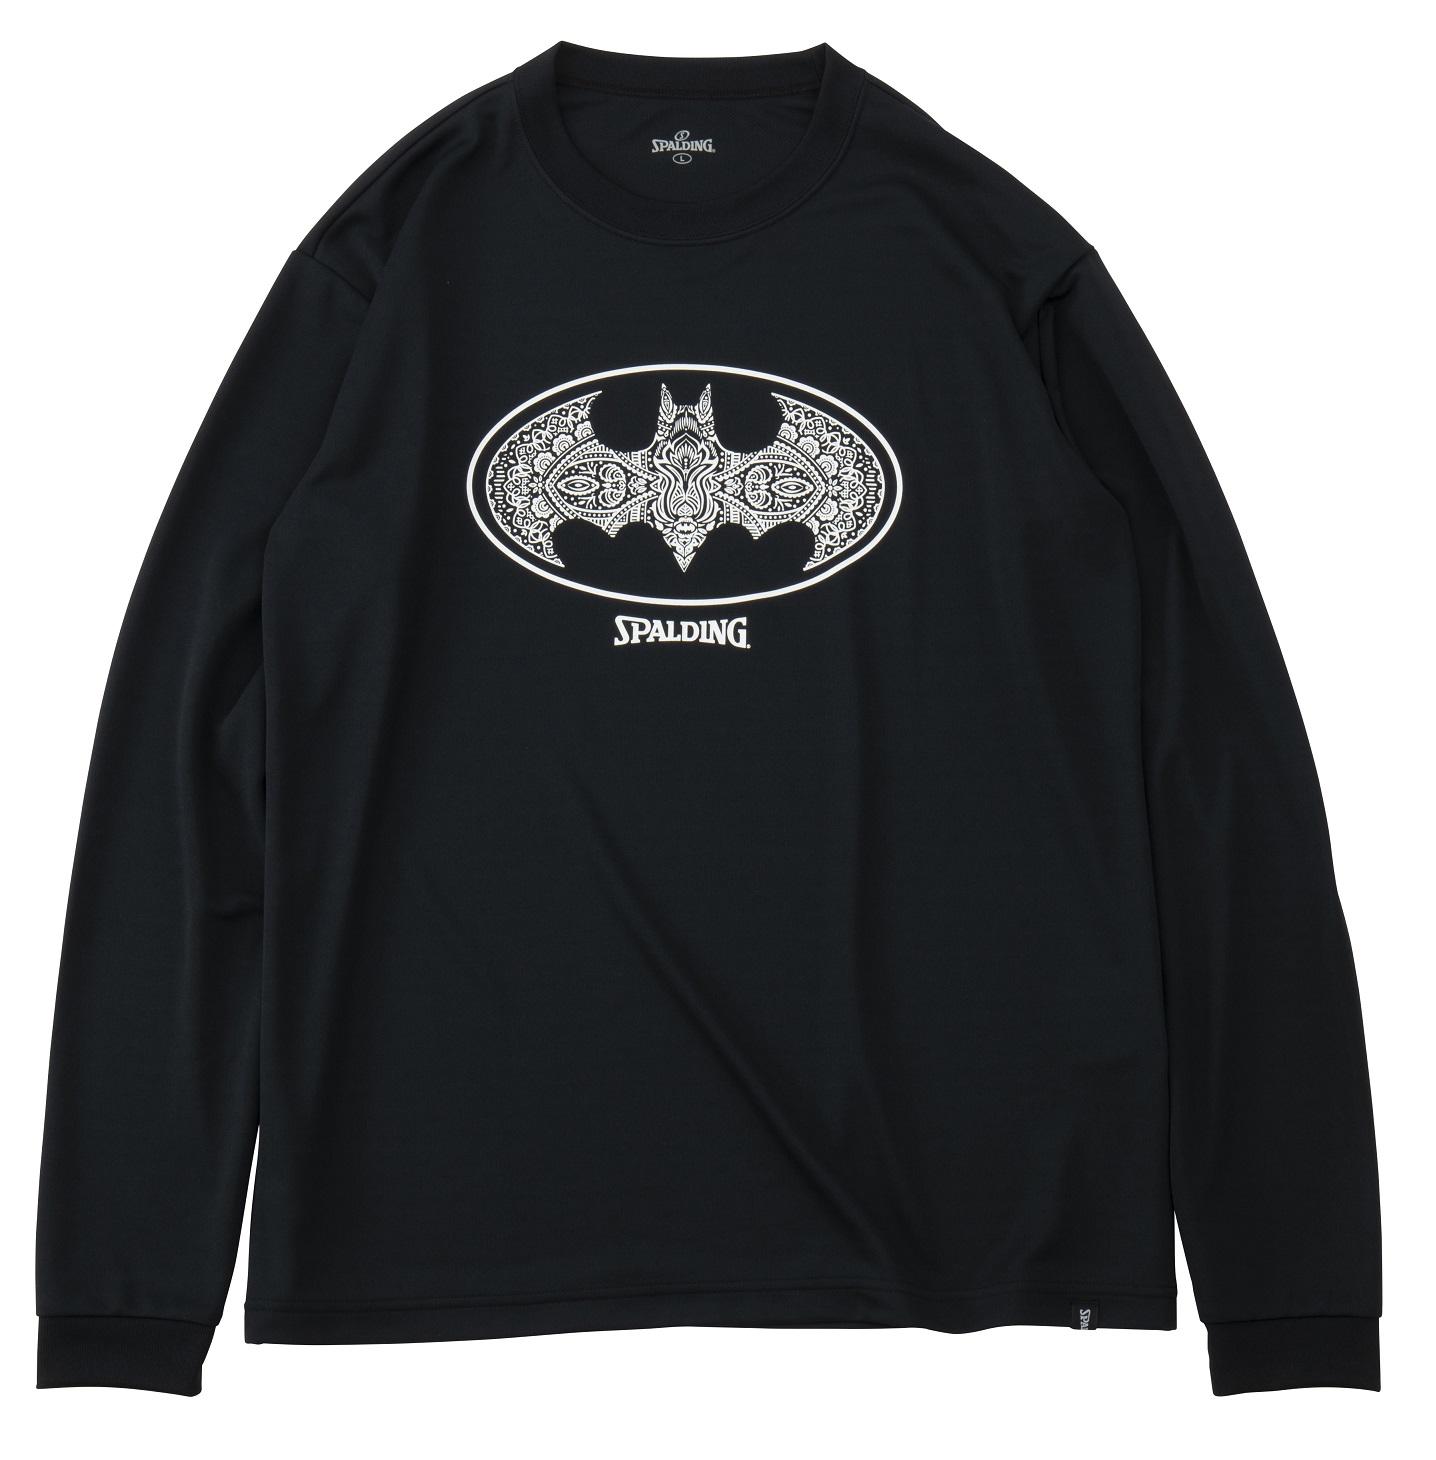 SMT191360 / SPALDING ロングスリーブ Tシャツ / バットマン ダマスクロゴ / バスケットボール / スポルディング